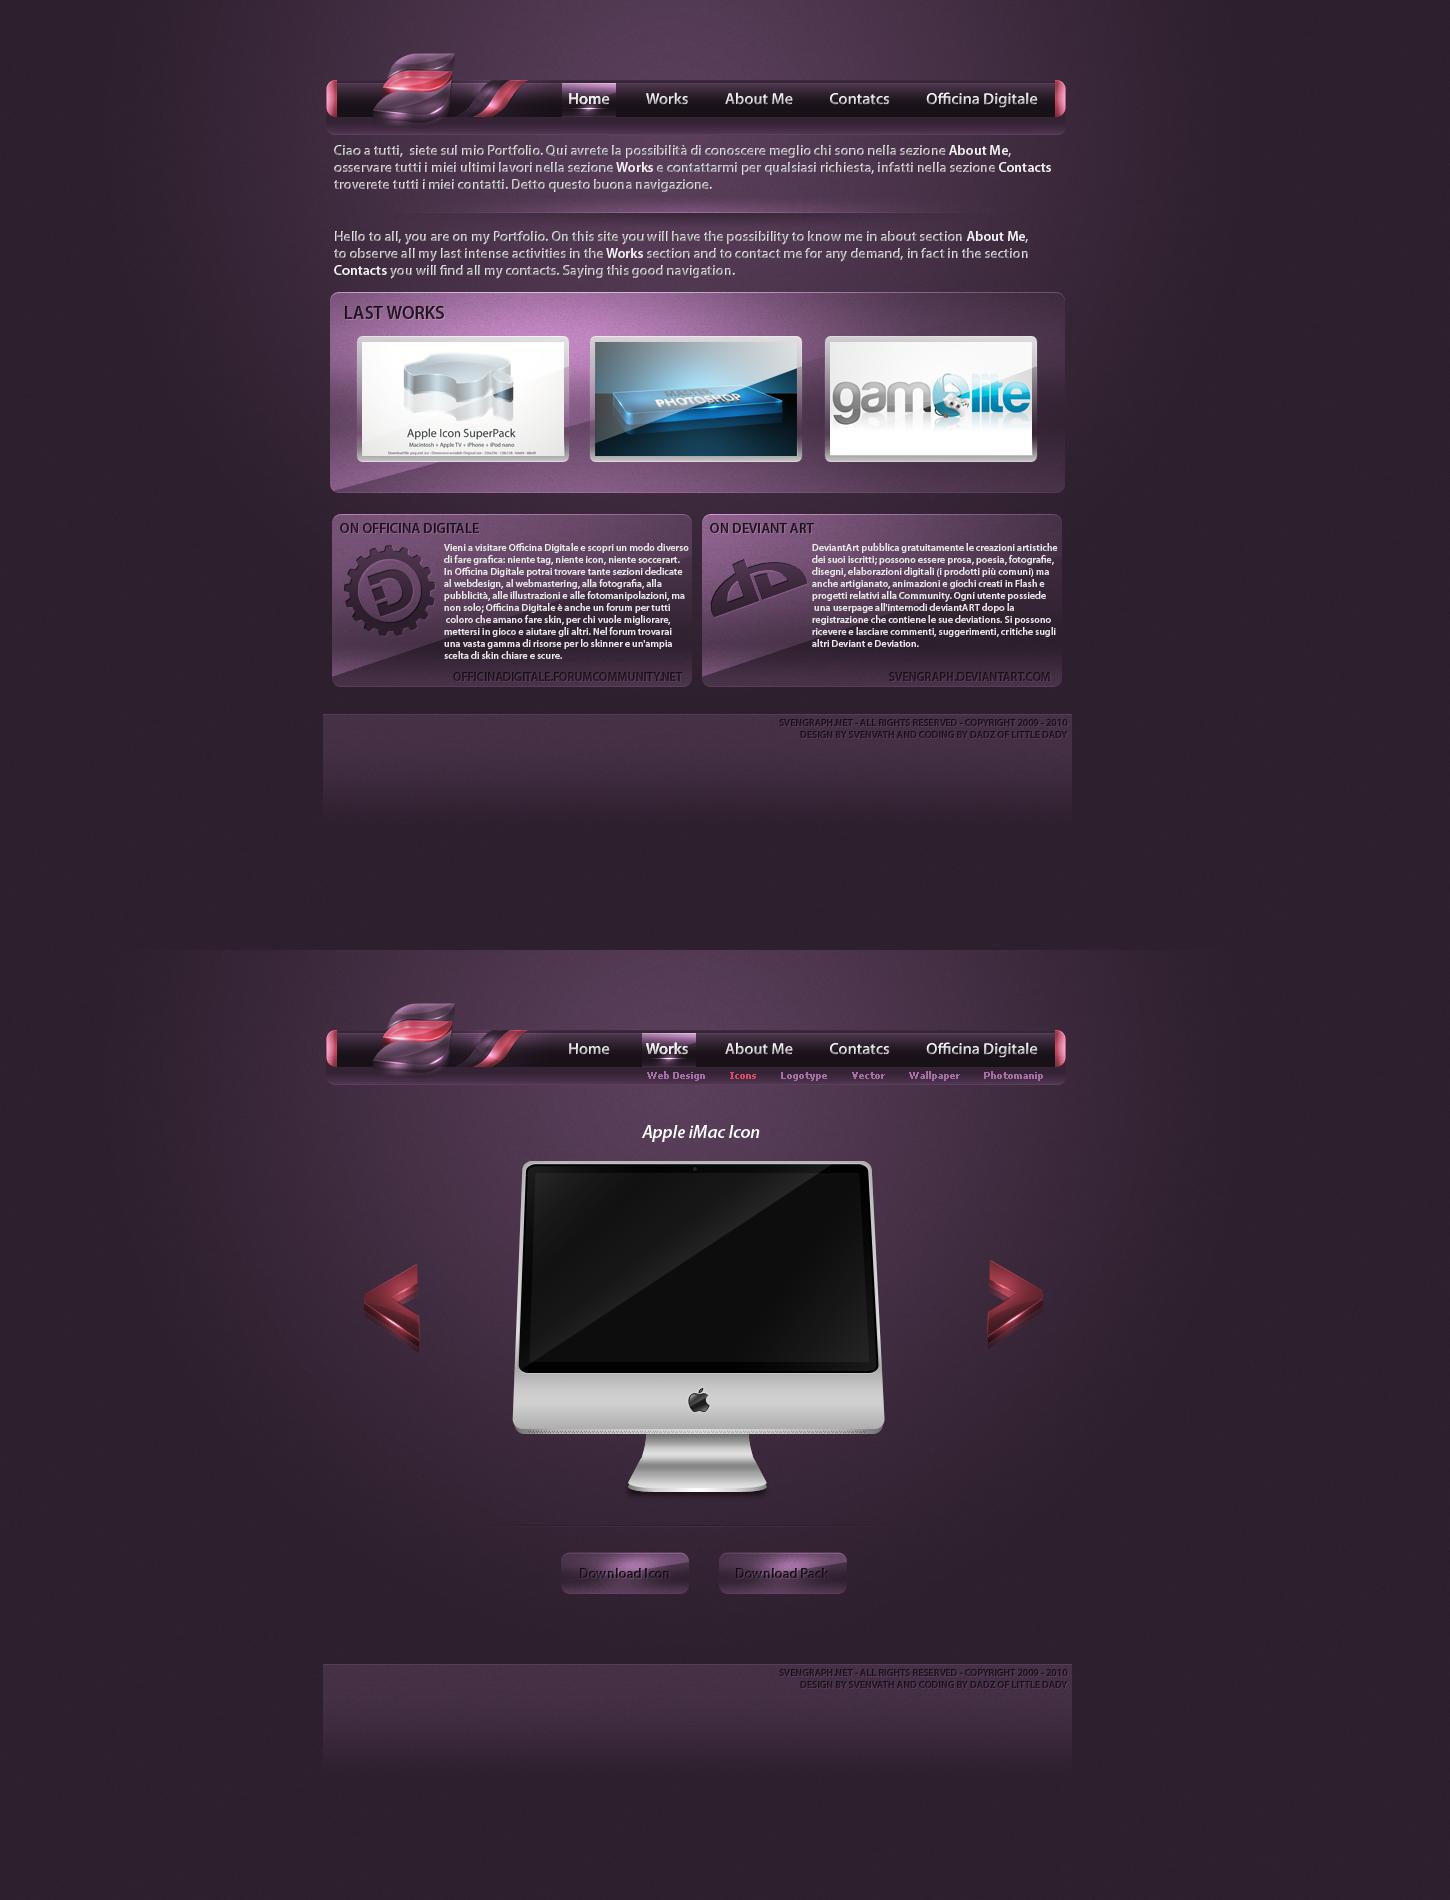 SvenGraph.net final version